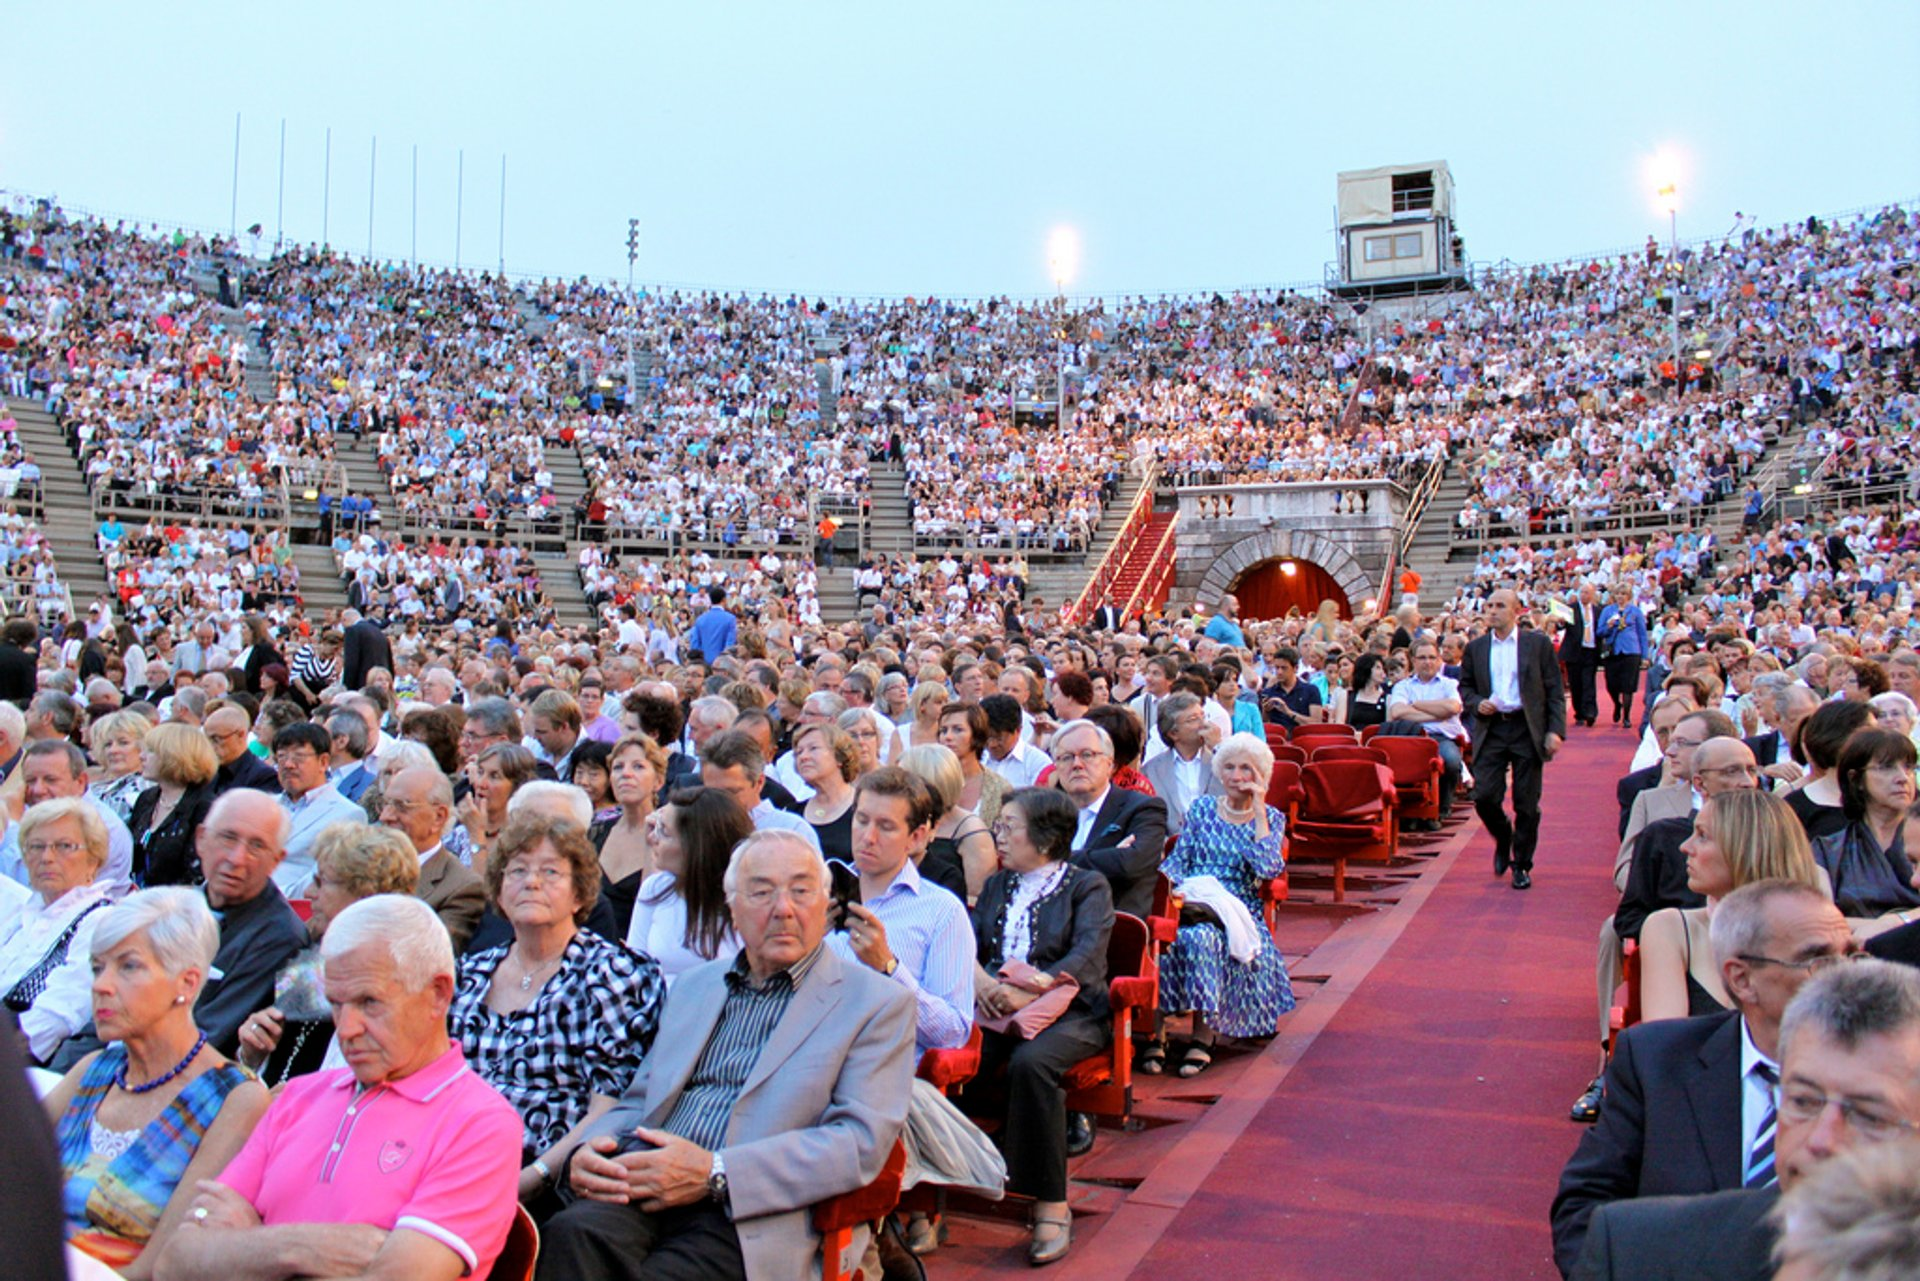 Arena di Verona Opera Festival in Italy 2020 - Best Time